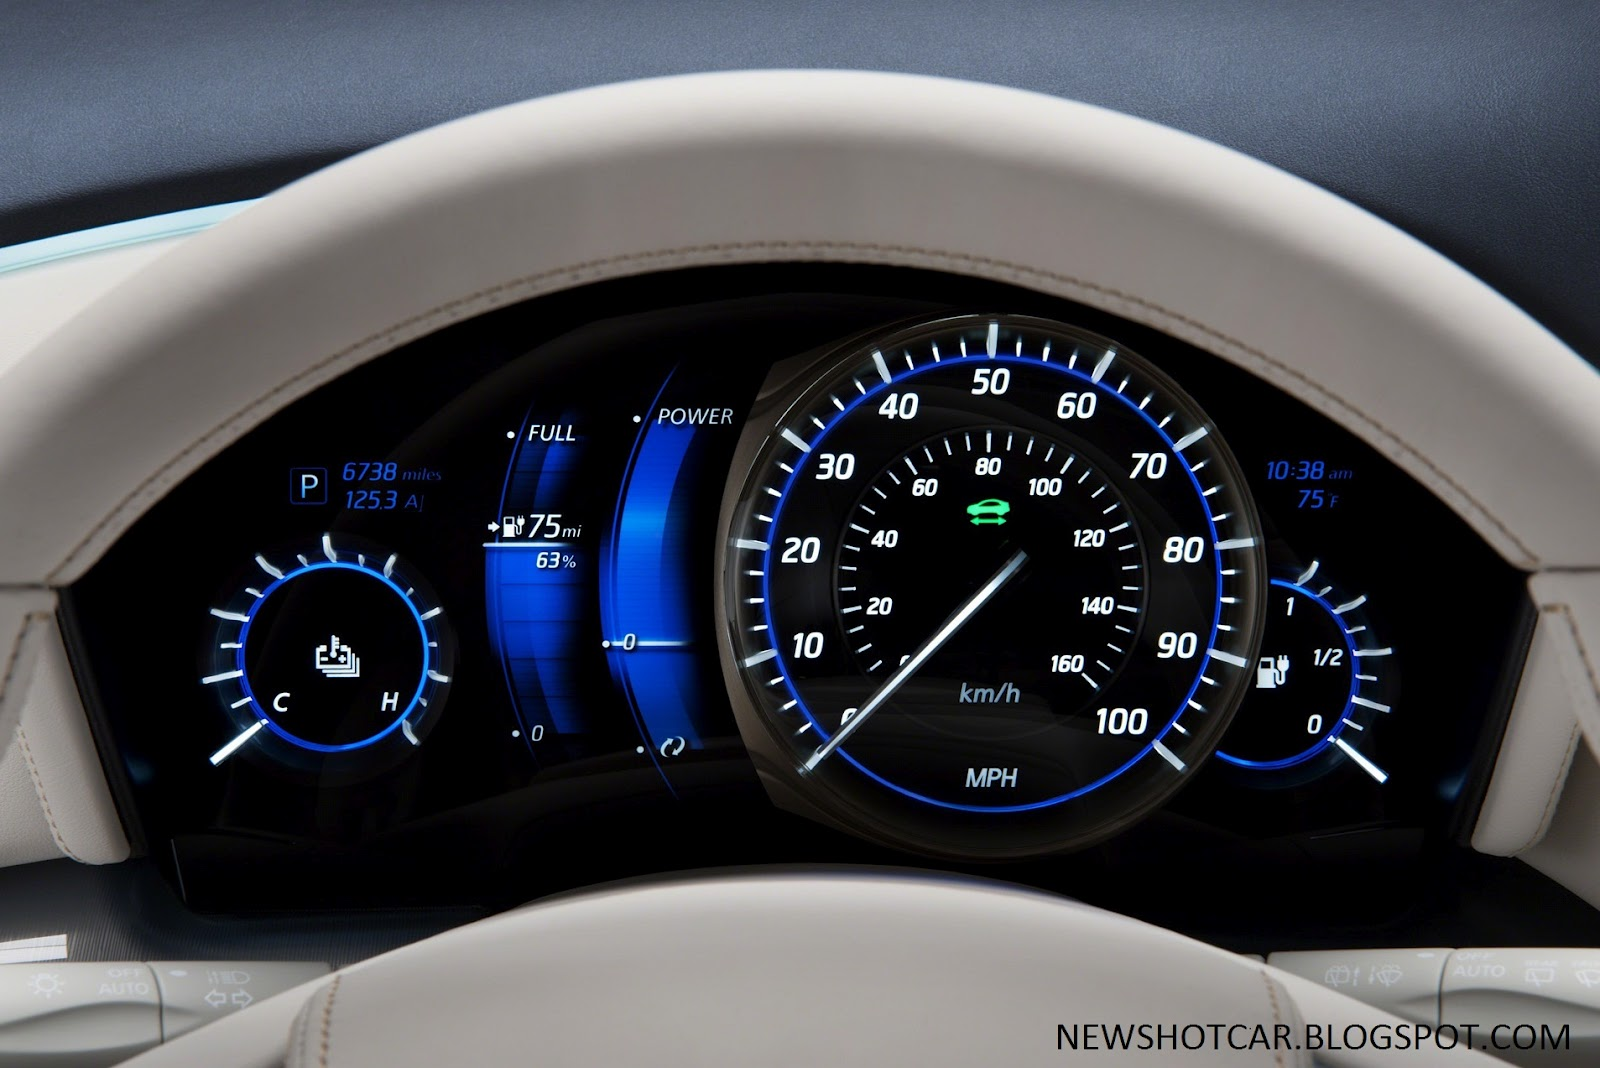 2012 infiniti le concept zero emission luxury sedan news hot car 2012 le concept console vanachro Image collections